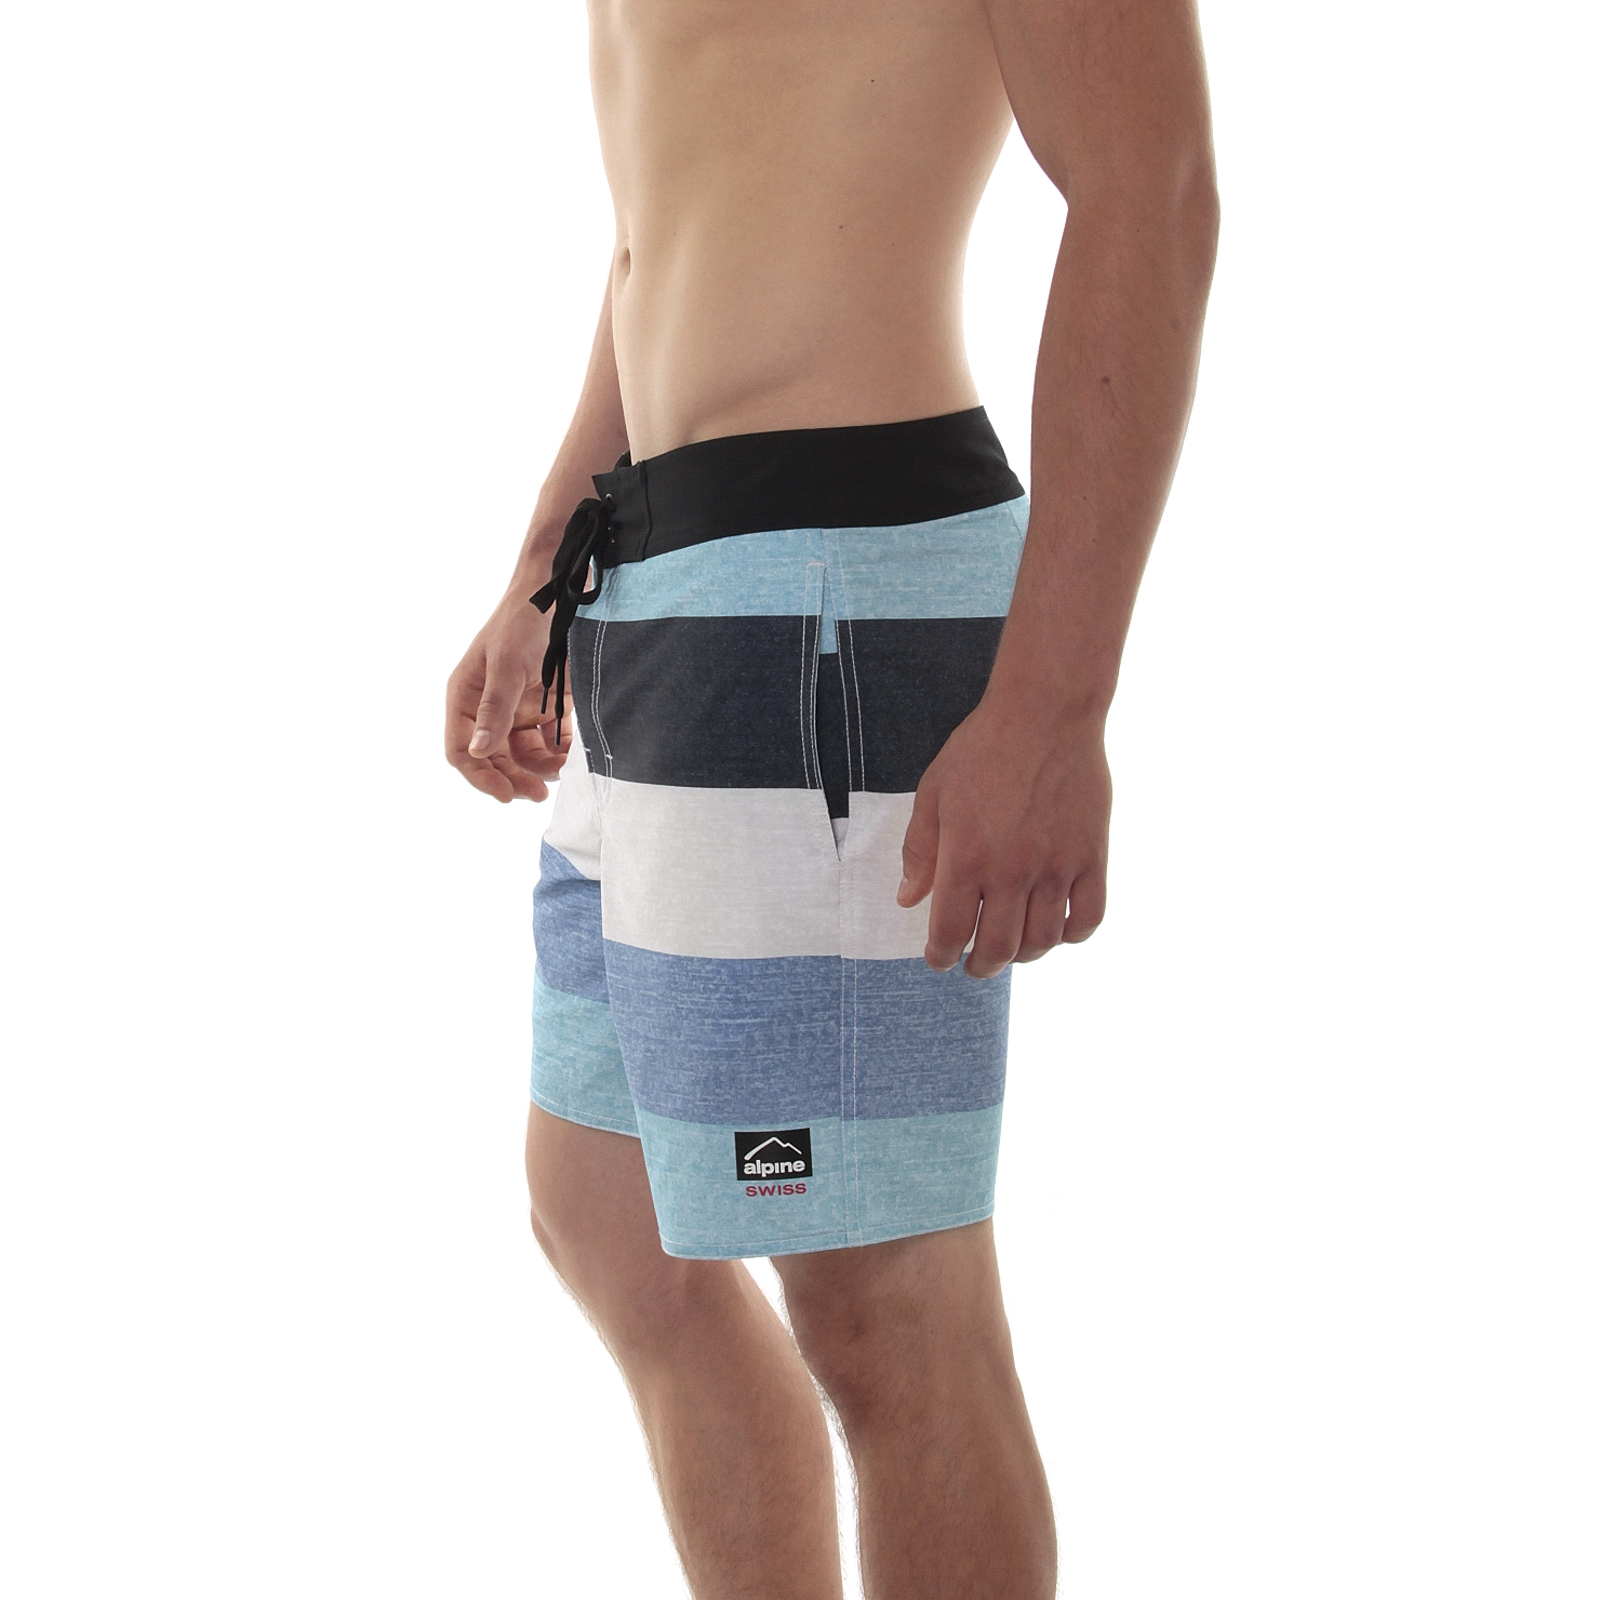 b2c9ca77bbb2 Alpine Swiss Mens Boardshorts Swim Trunks Hybrid Short Side Pockets ...